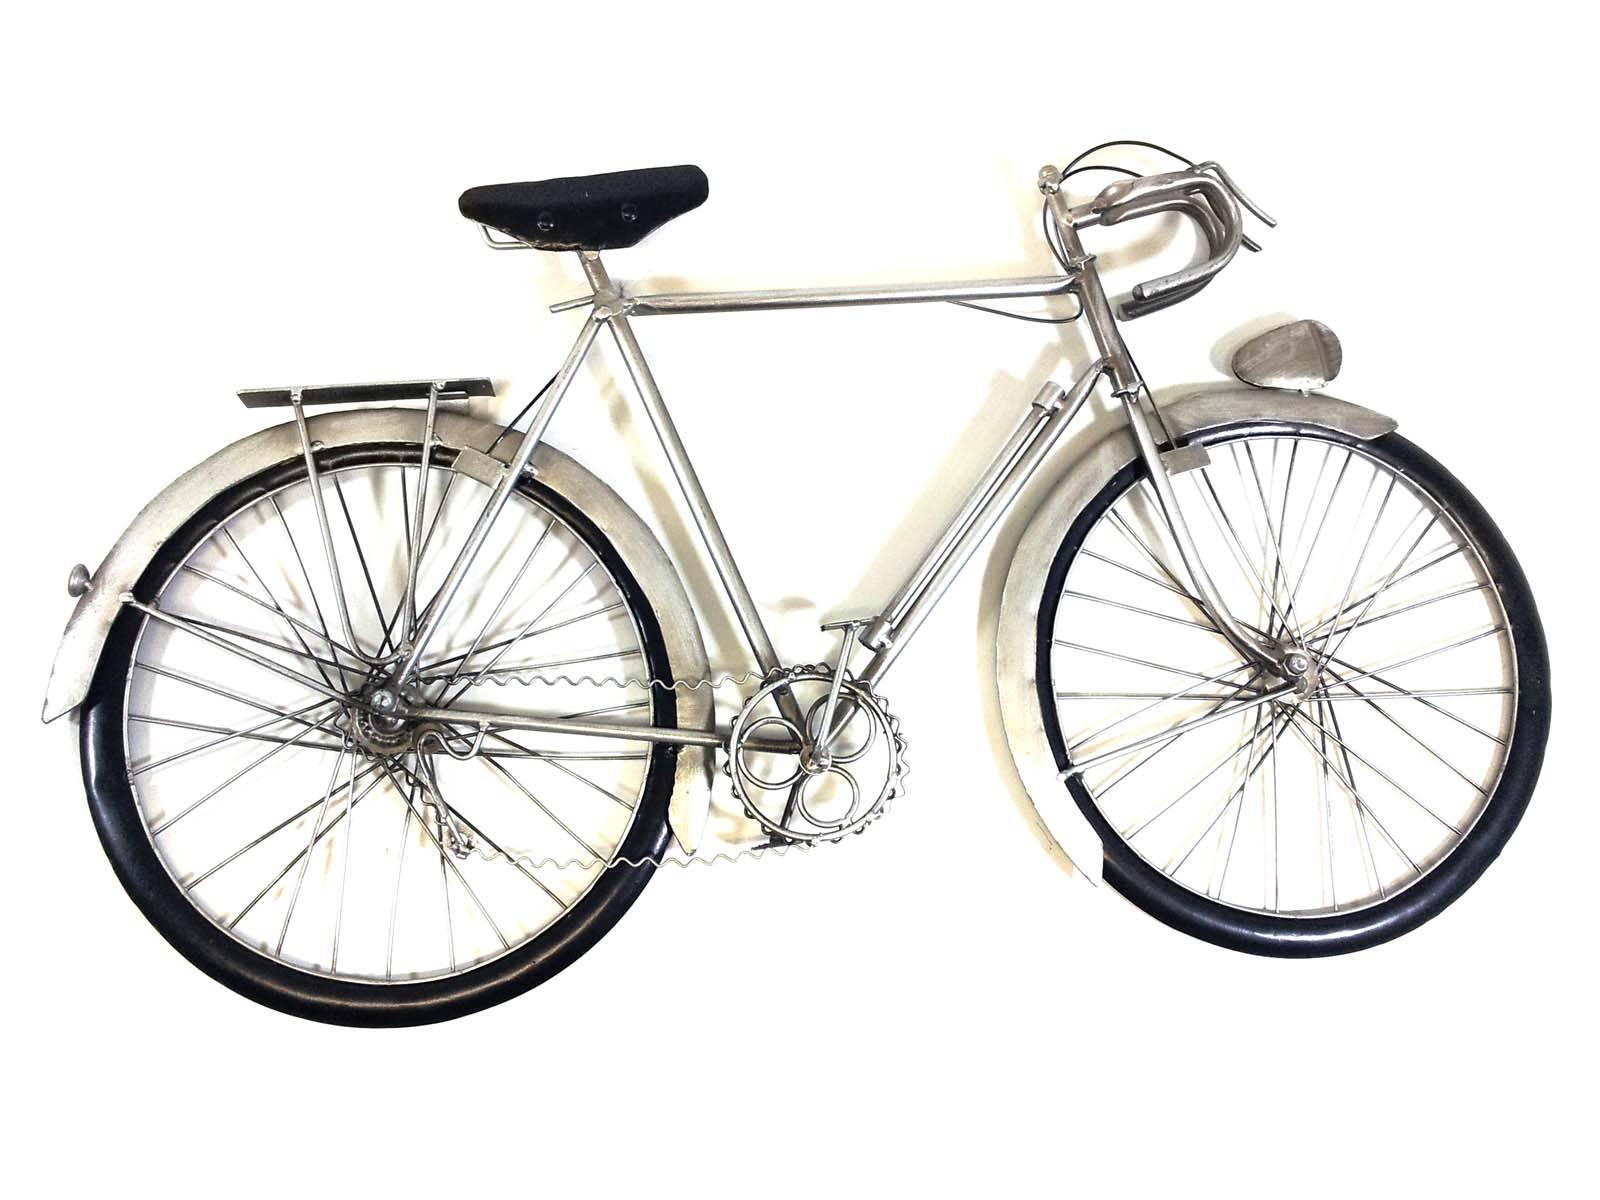 Metal Wall Art – Silver Racing Bike Regarding Latest Bicycle Metal Wall Art (View 9 of 20)